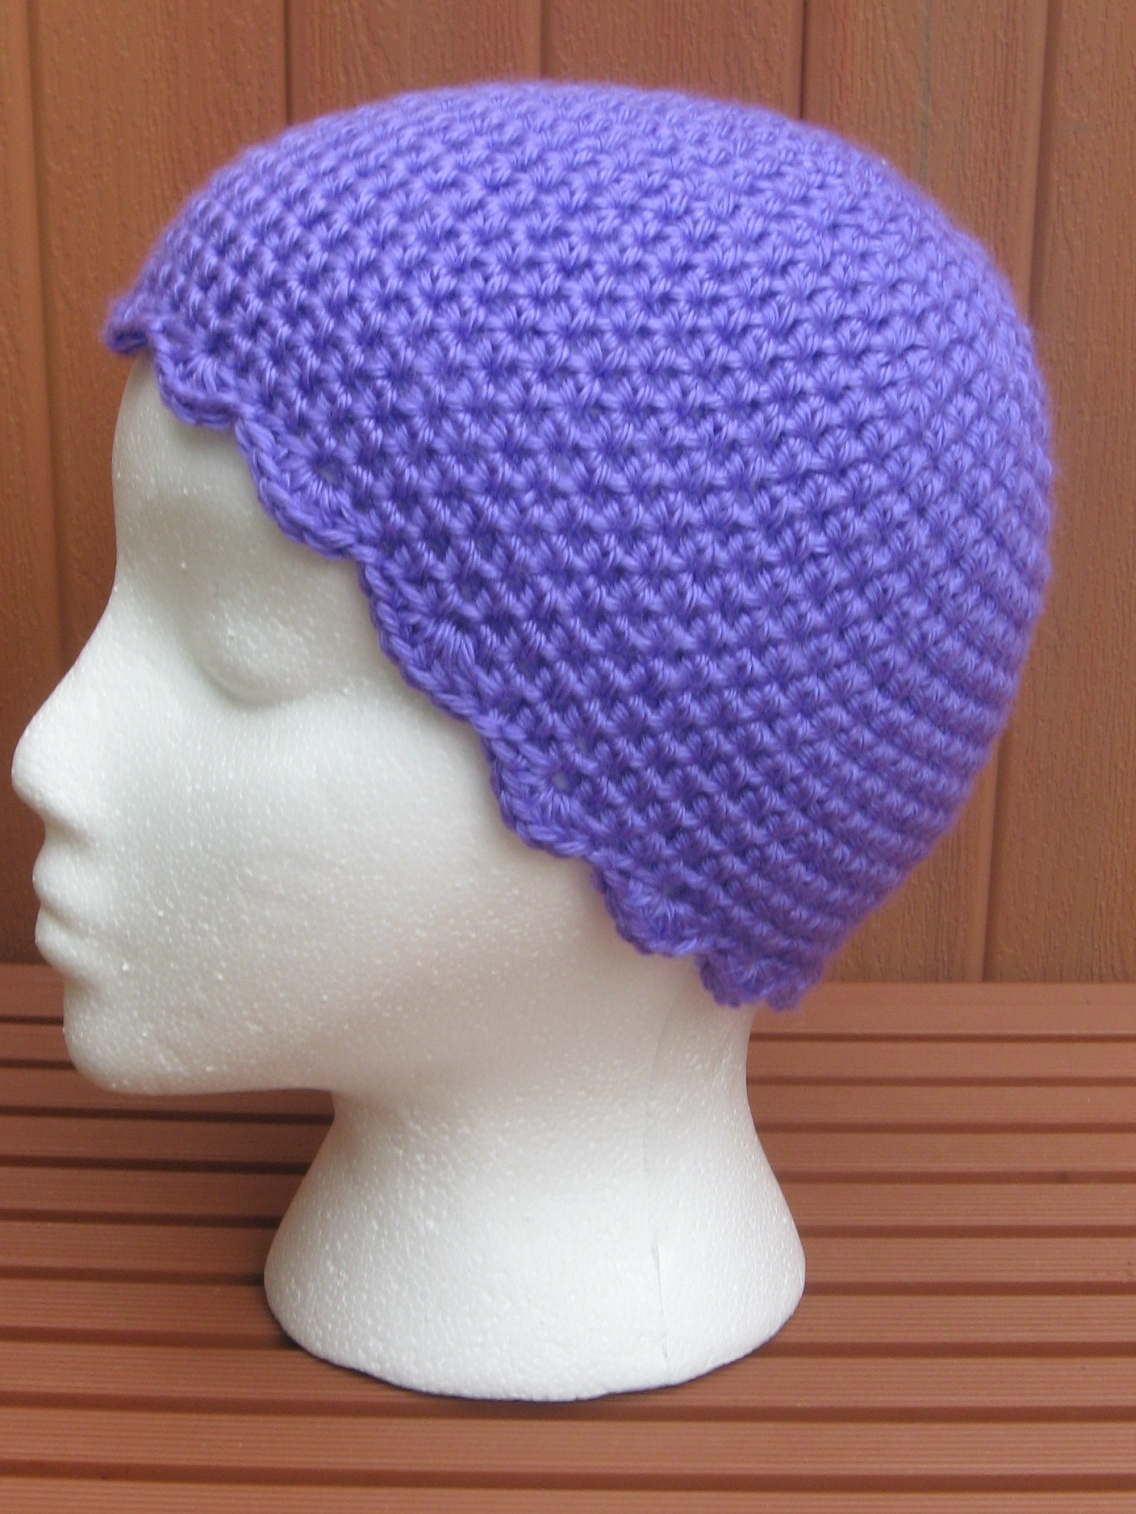 Crochet Projects Crochet Chemo Sleep Cap